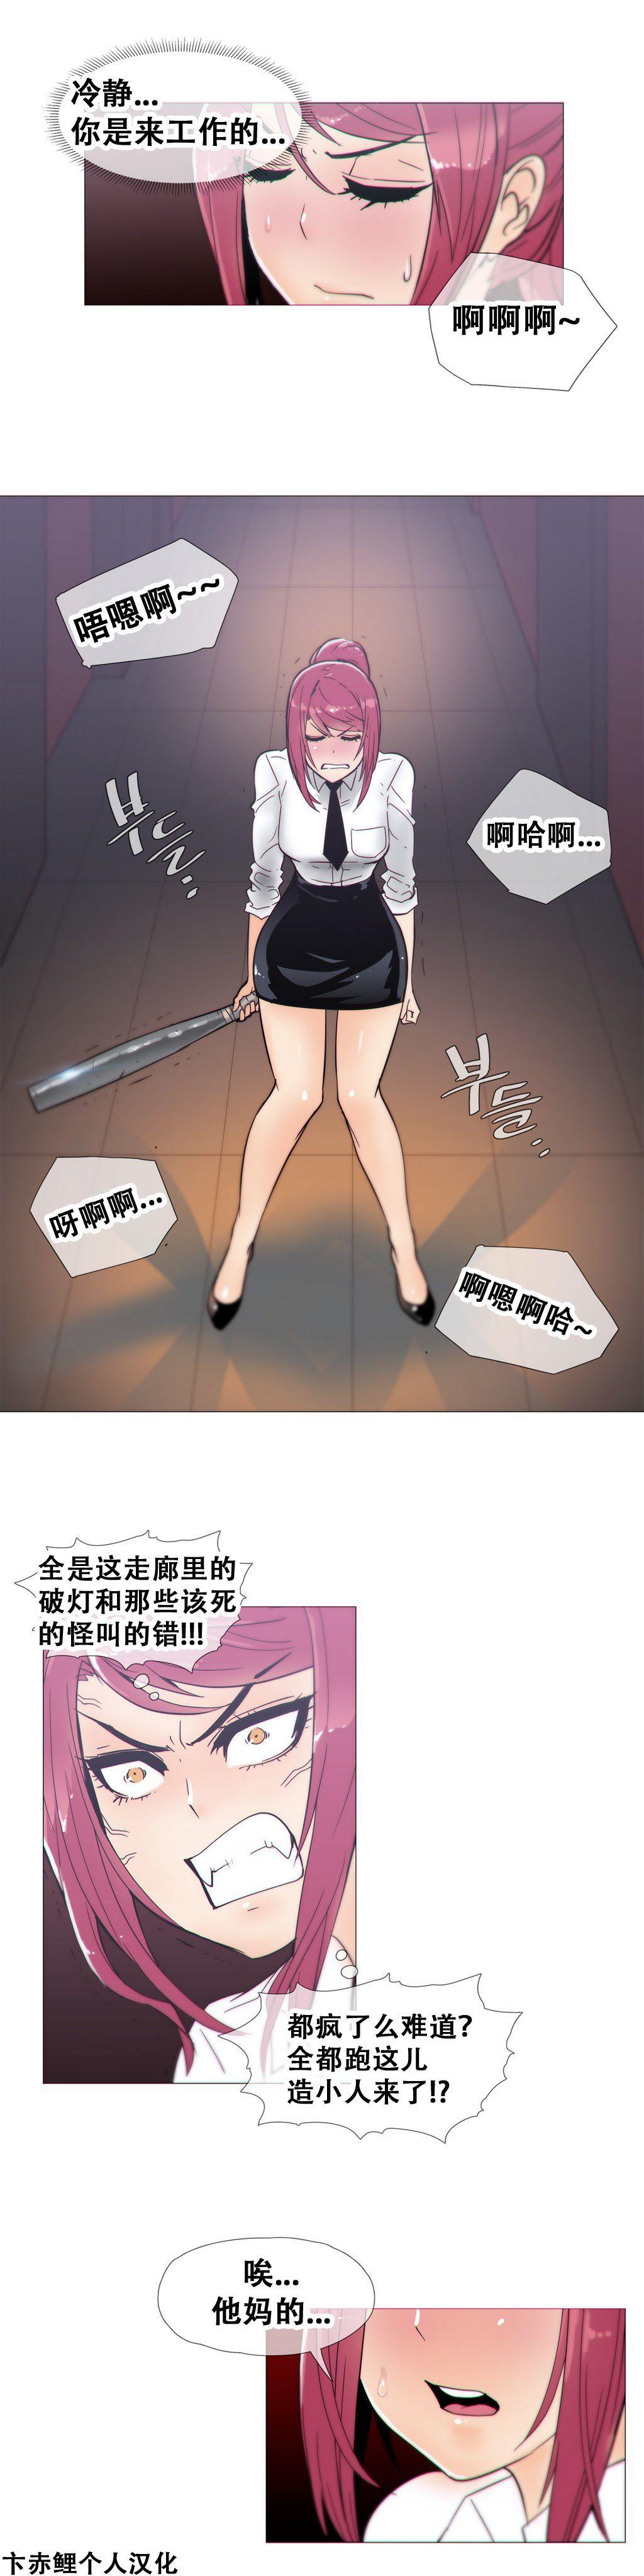 HouseHold Affairs 【卞赤鲤汉化】1~15话 308